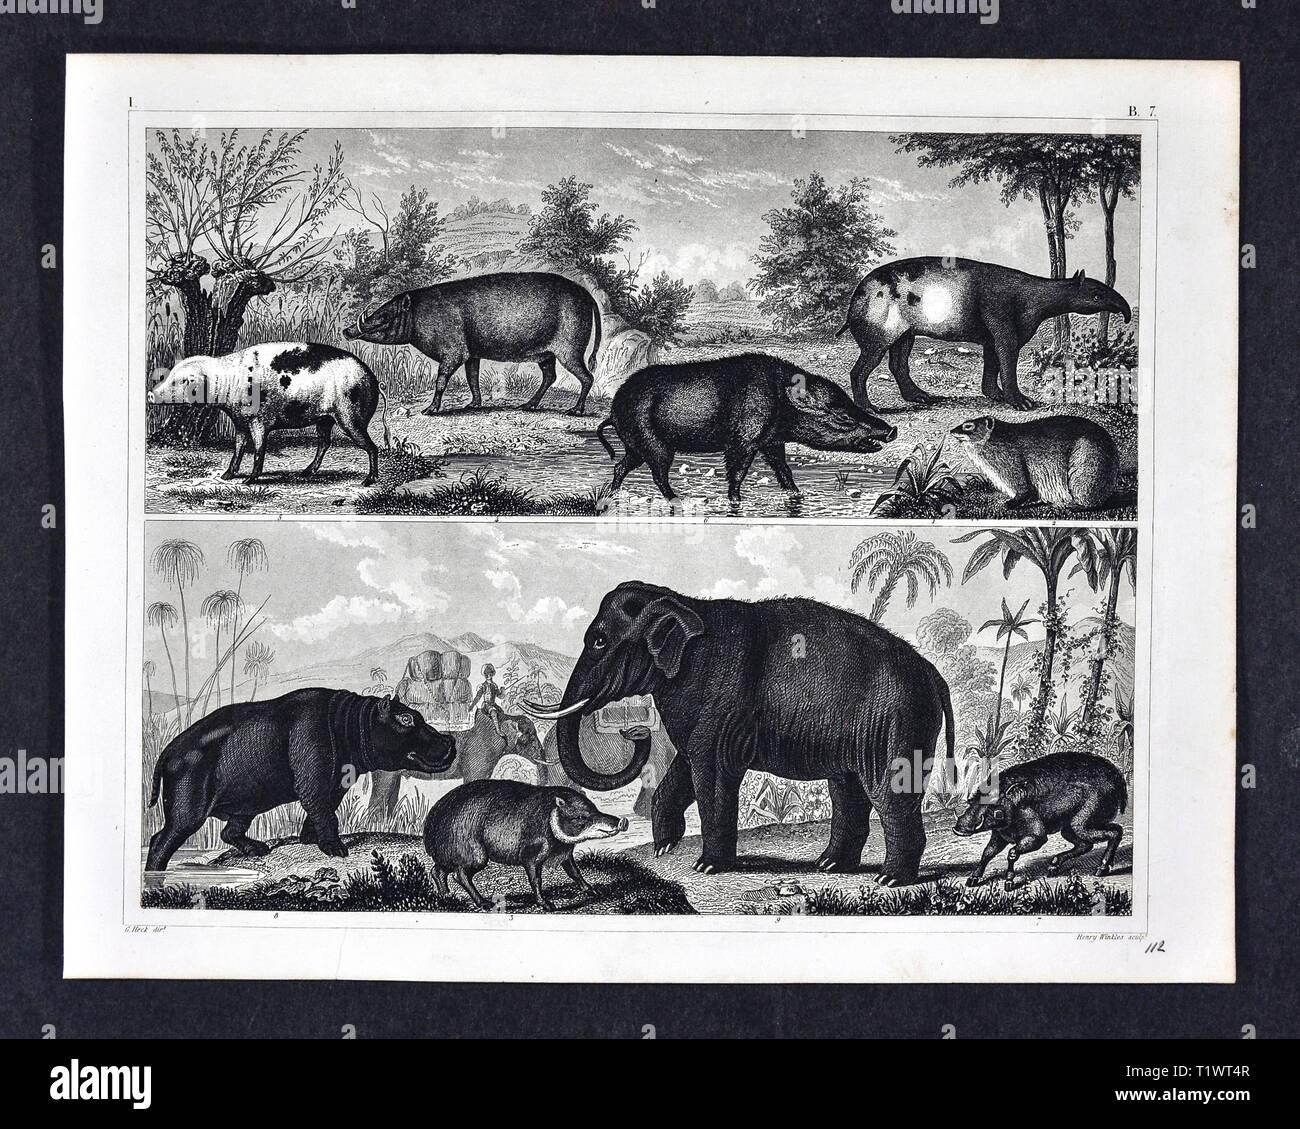 1849 Zoological Print - Wildlife Animals - Mammals - Tapirs, Pigs, Hippopotamus and Elephant - Stock Image